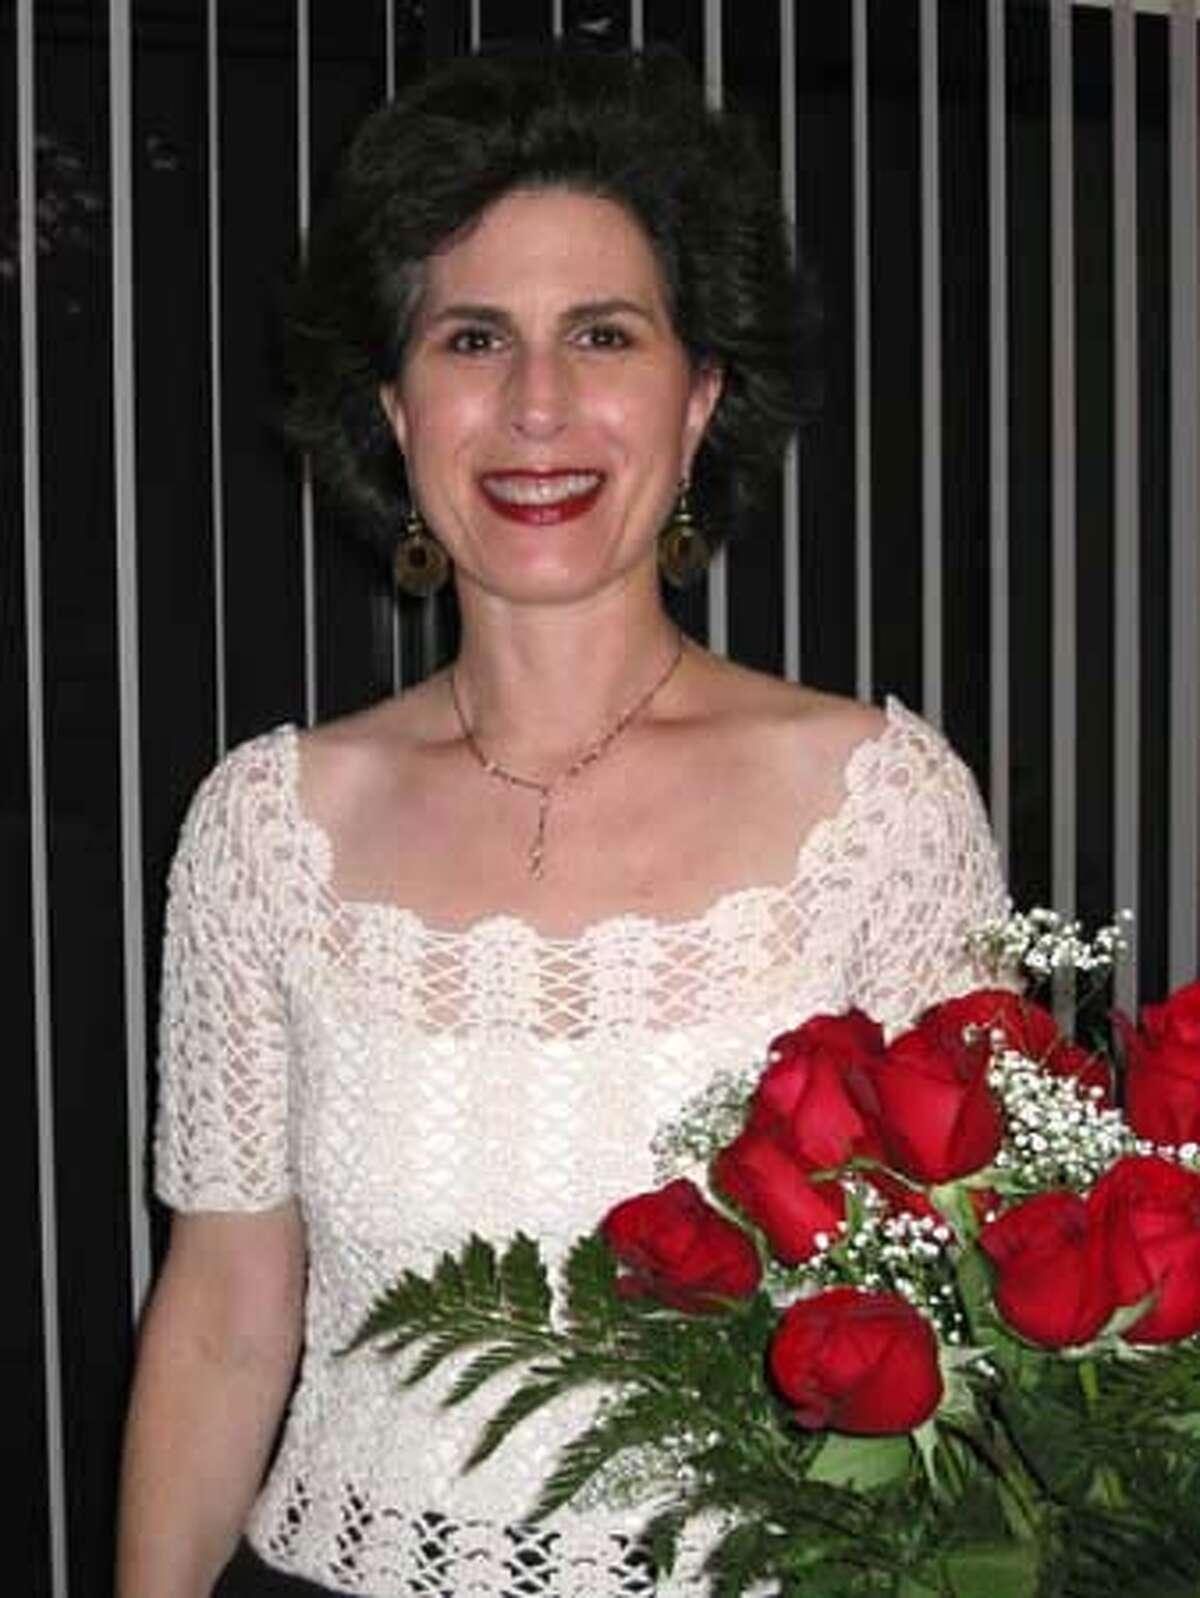 Obituary photo of Sandra Britt. Sandy on her birthday 2 wks after diagnosis